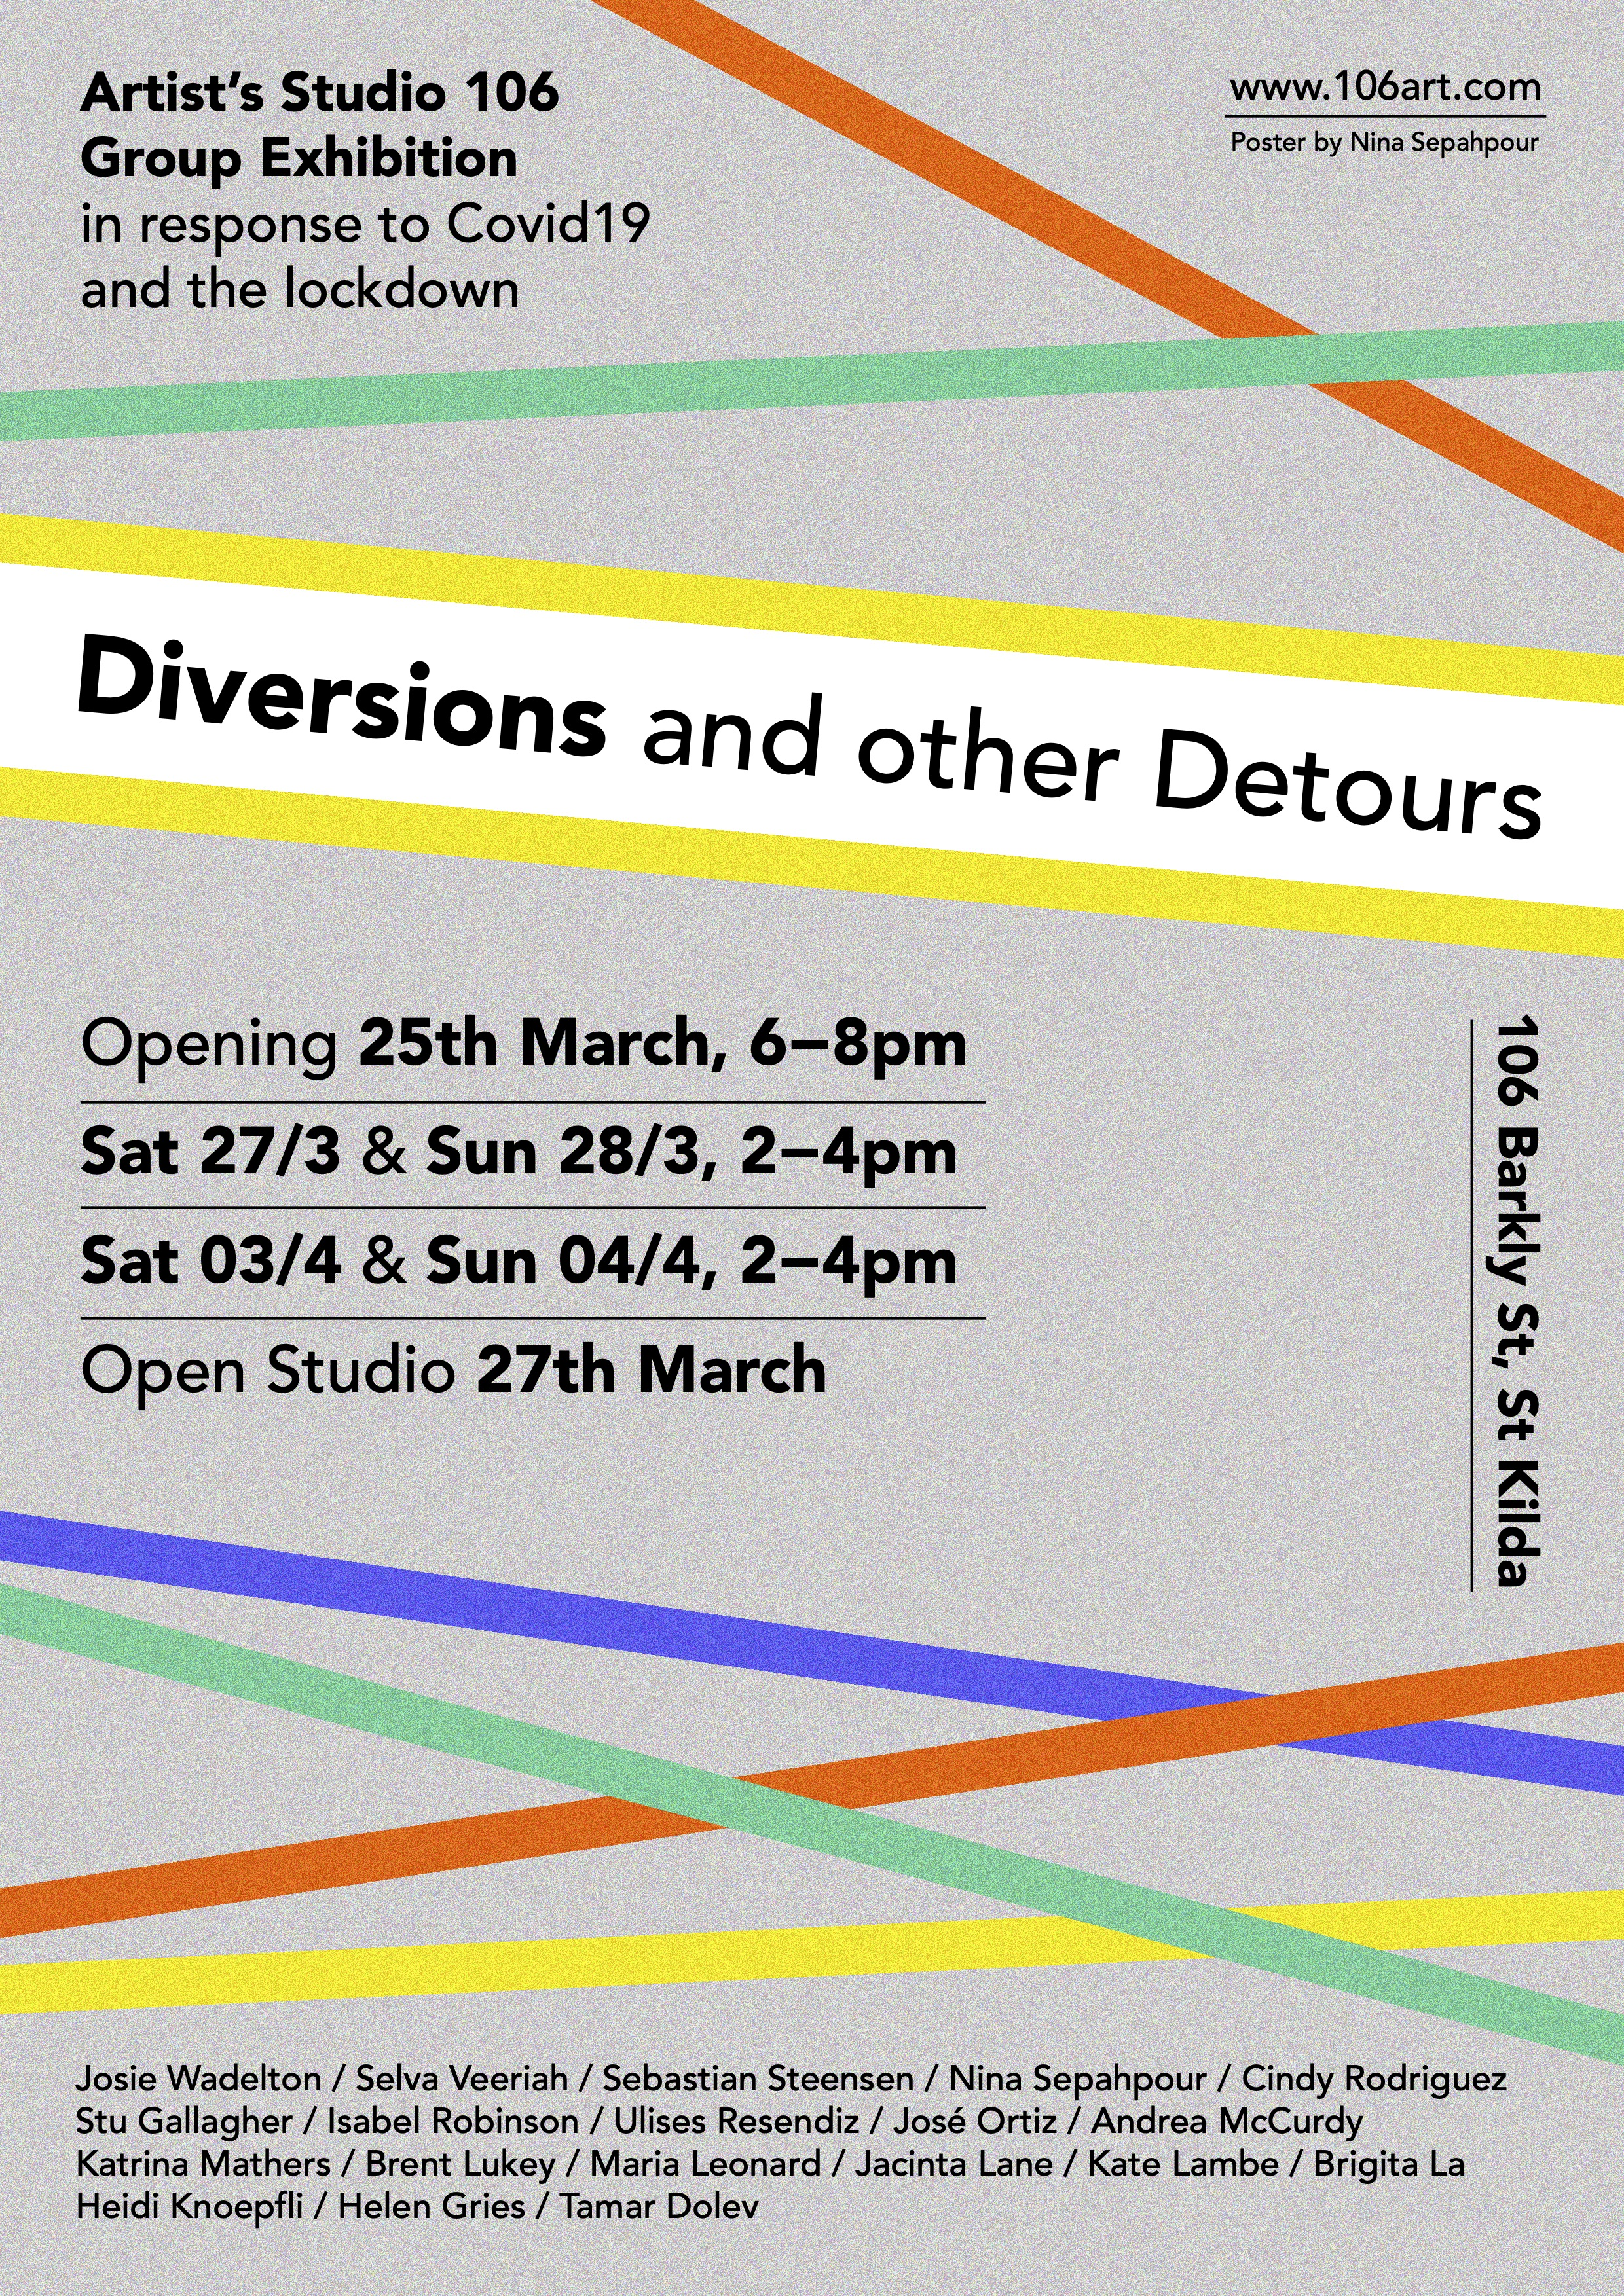 Artists Studio 106 - Promotional flyer for group exhibition 'Diversions & Detours' at Artists'